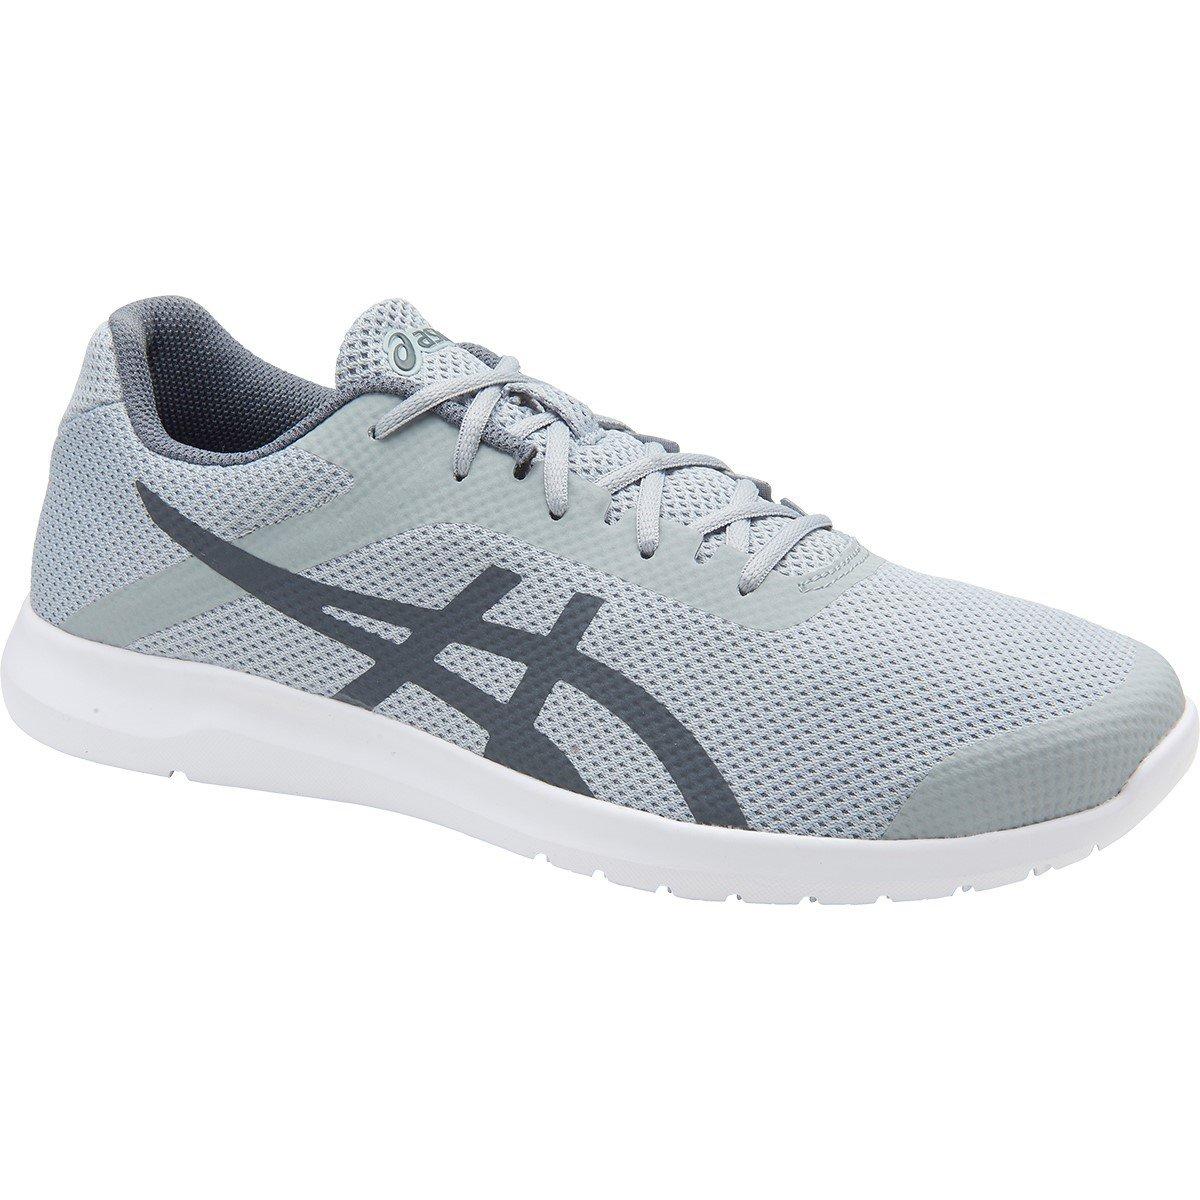 Running Shoes-11 UK/India (46.5 EU